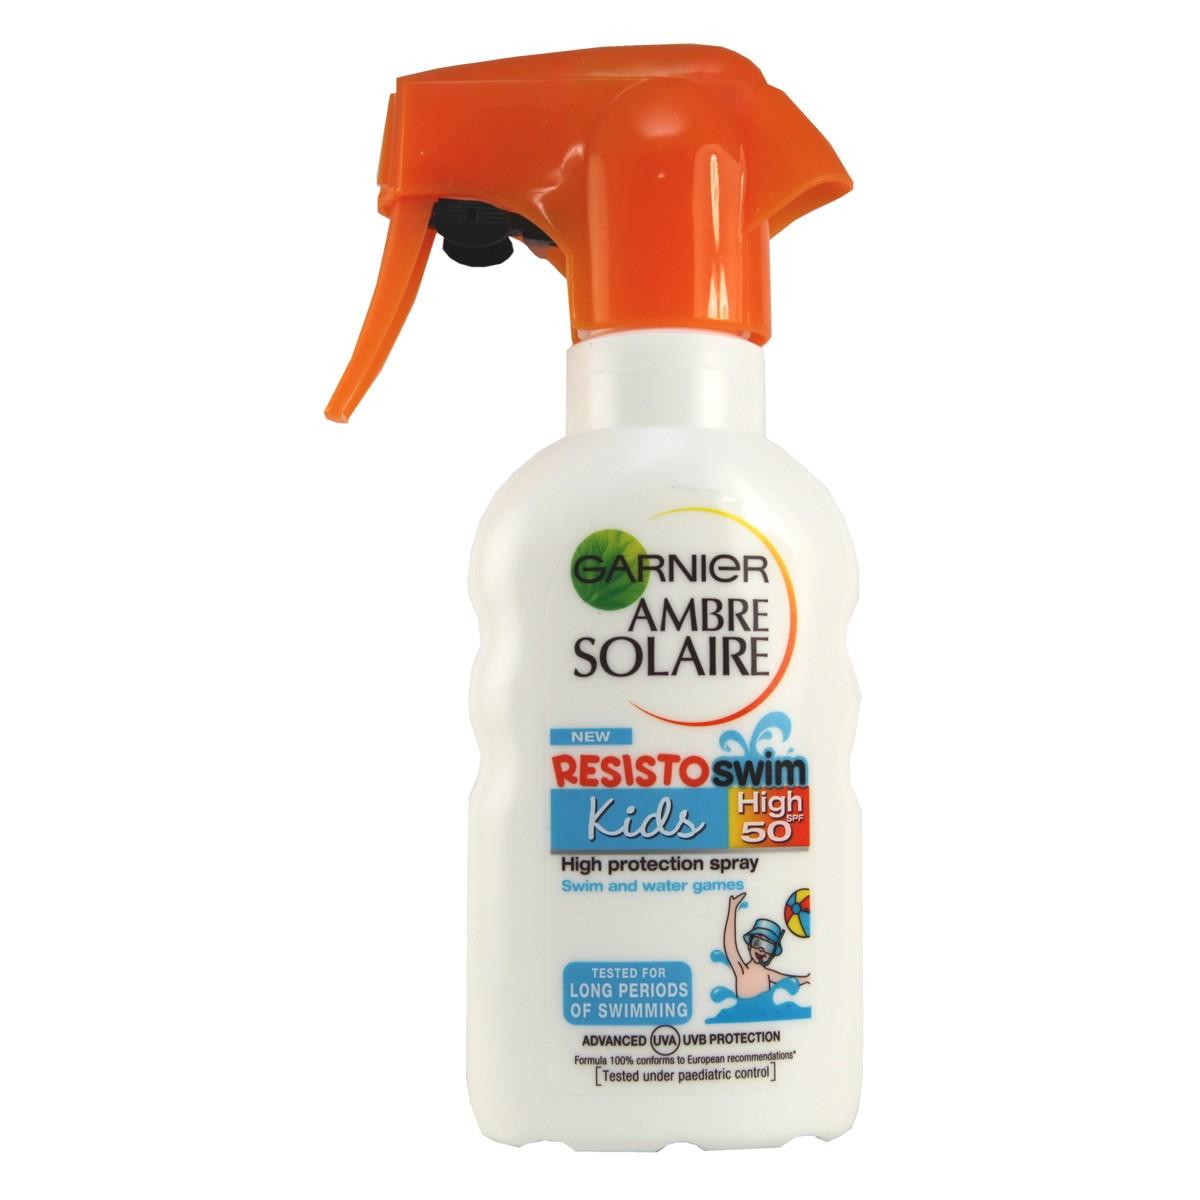 Garnier Ambre Solaire Resisto  Swim Kids Spray SPF50